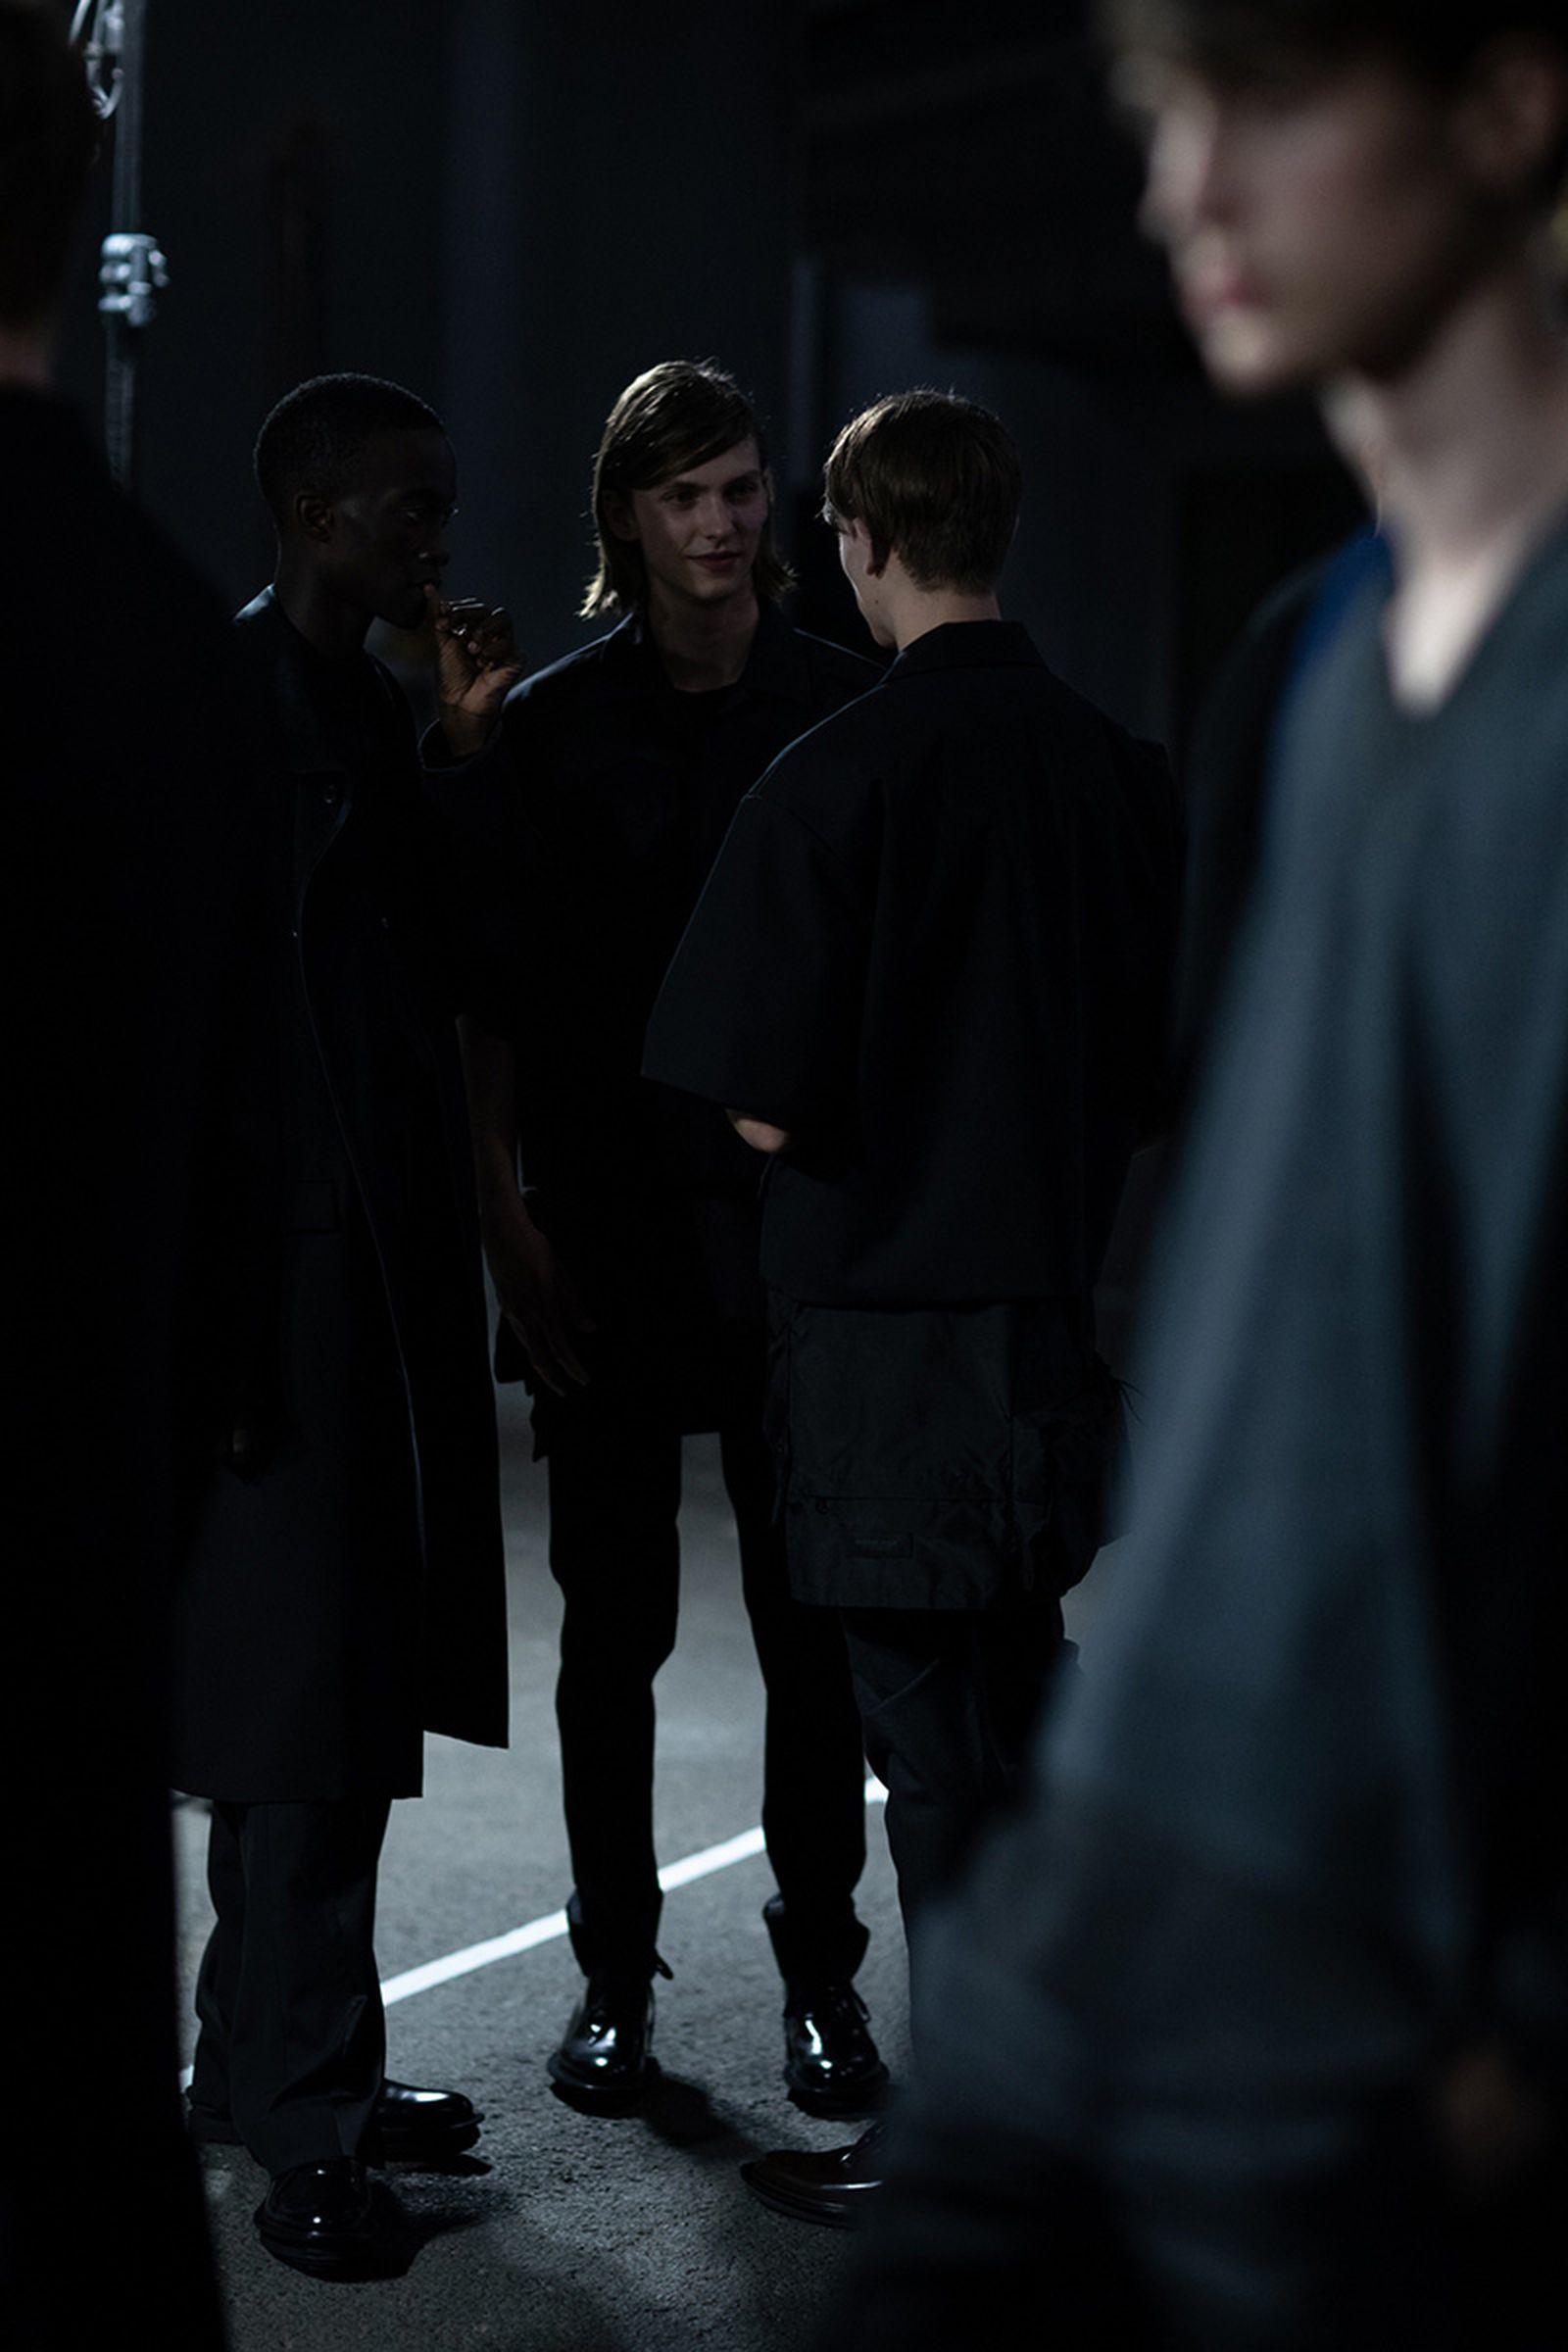 undercover ss20 menswear collection jun takahashi paris fashion week runway